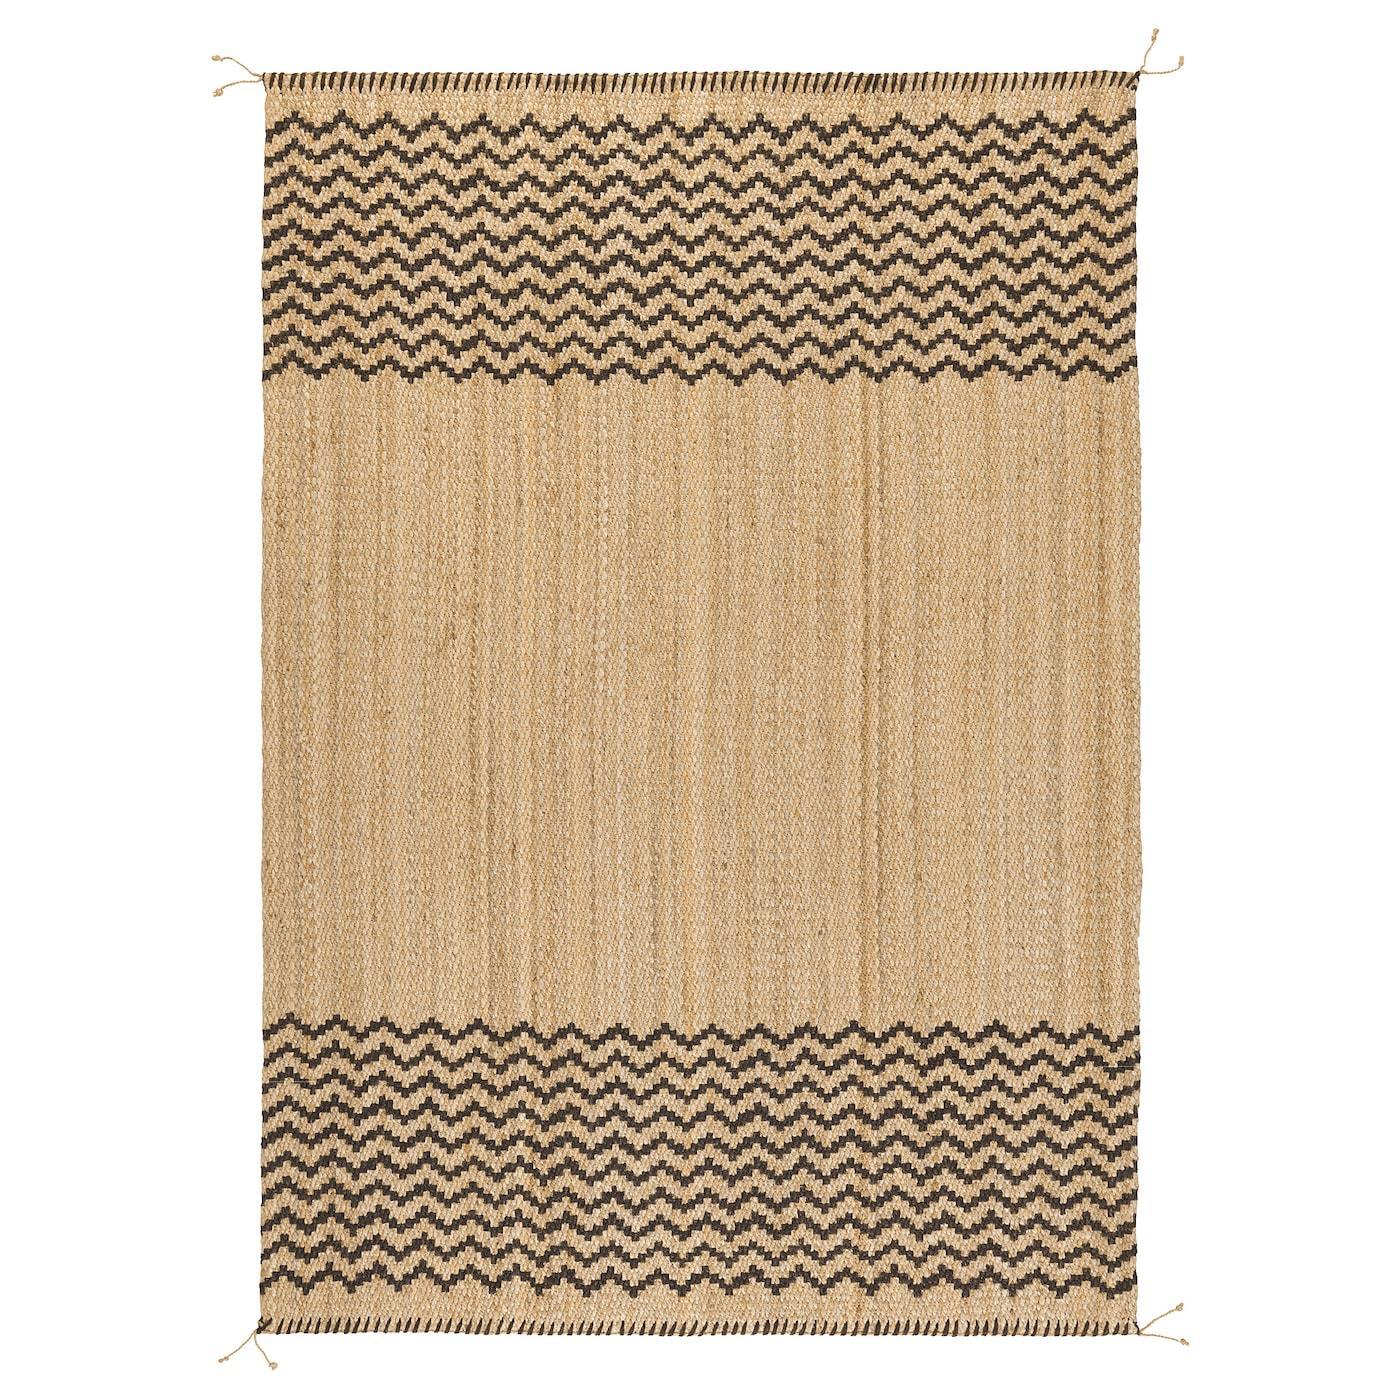 Lonholt Tapis Tisse A Plat Naturel Brun Fonce 160 X 230 Cm Ikea